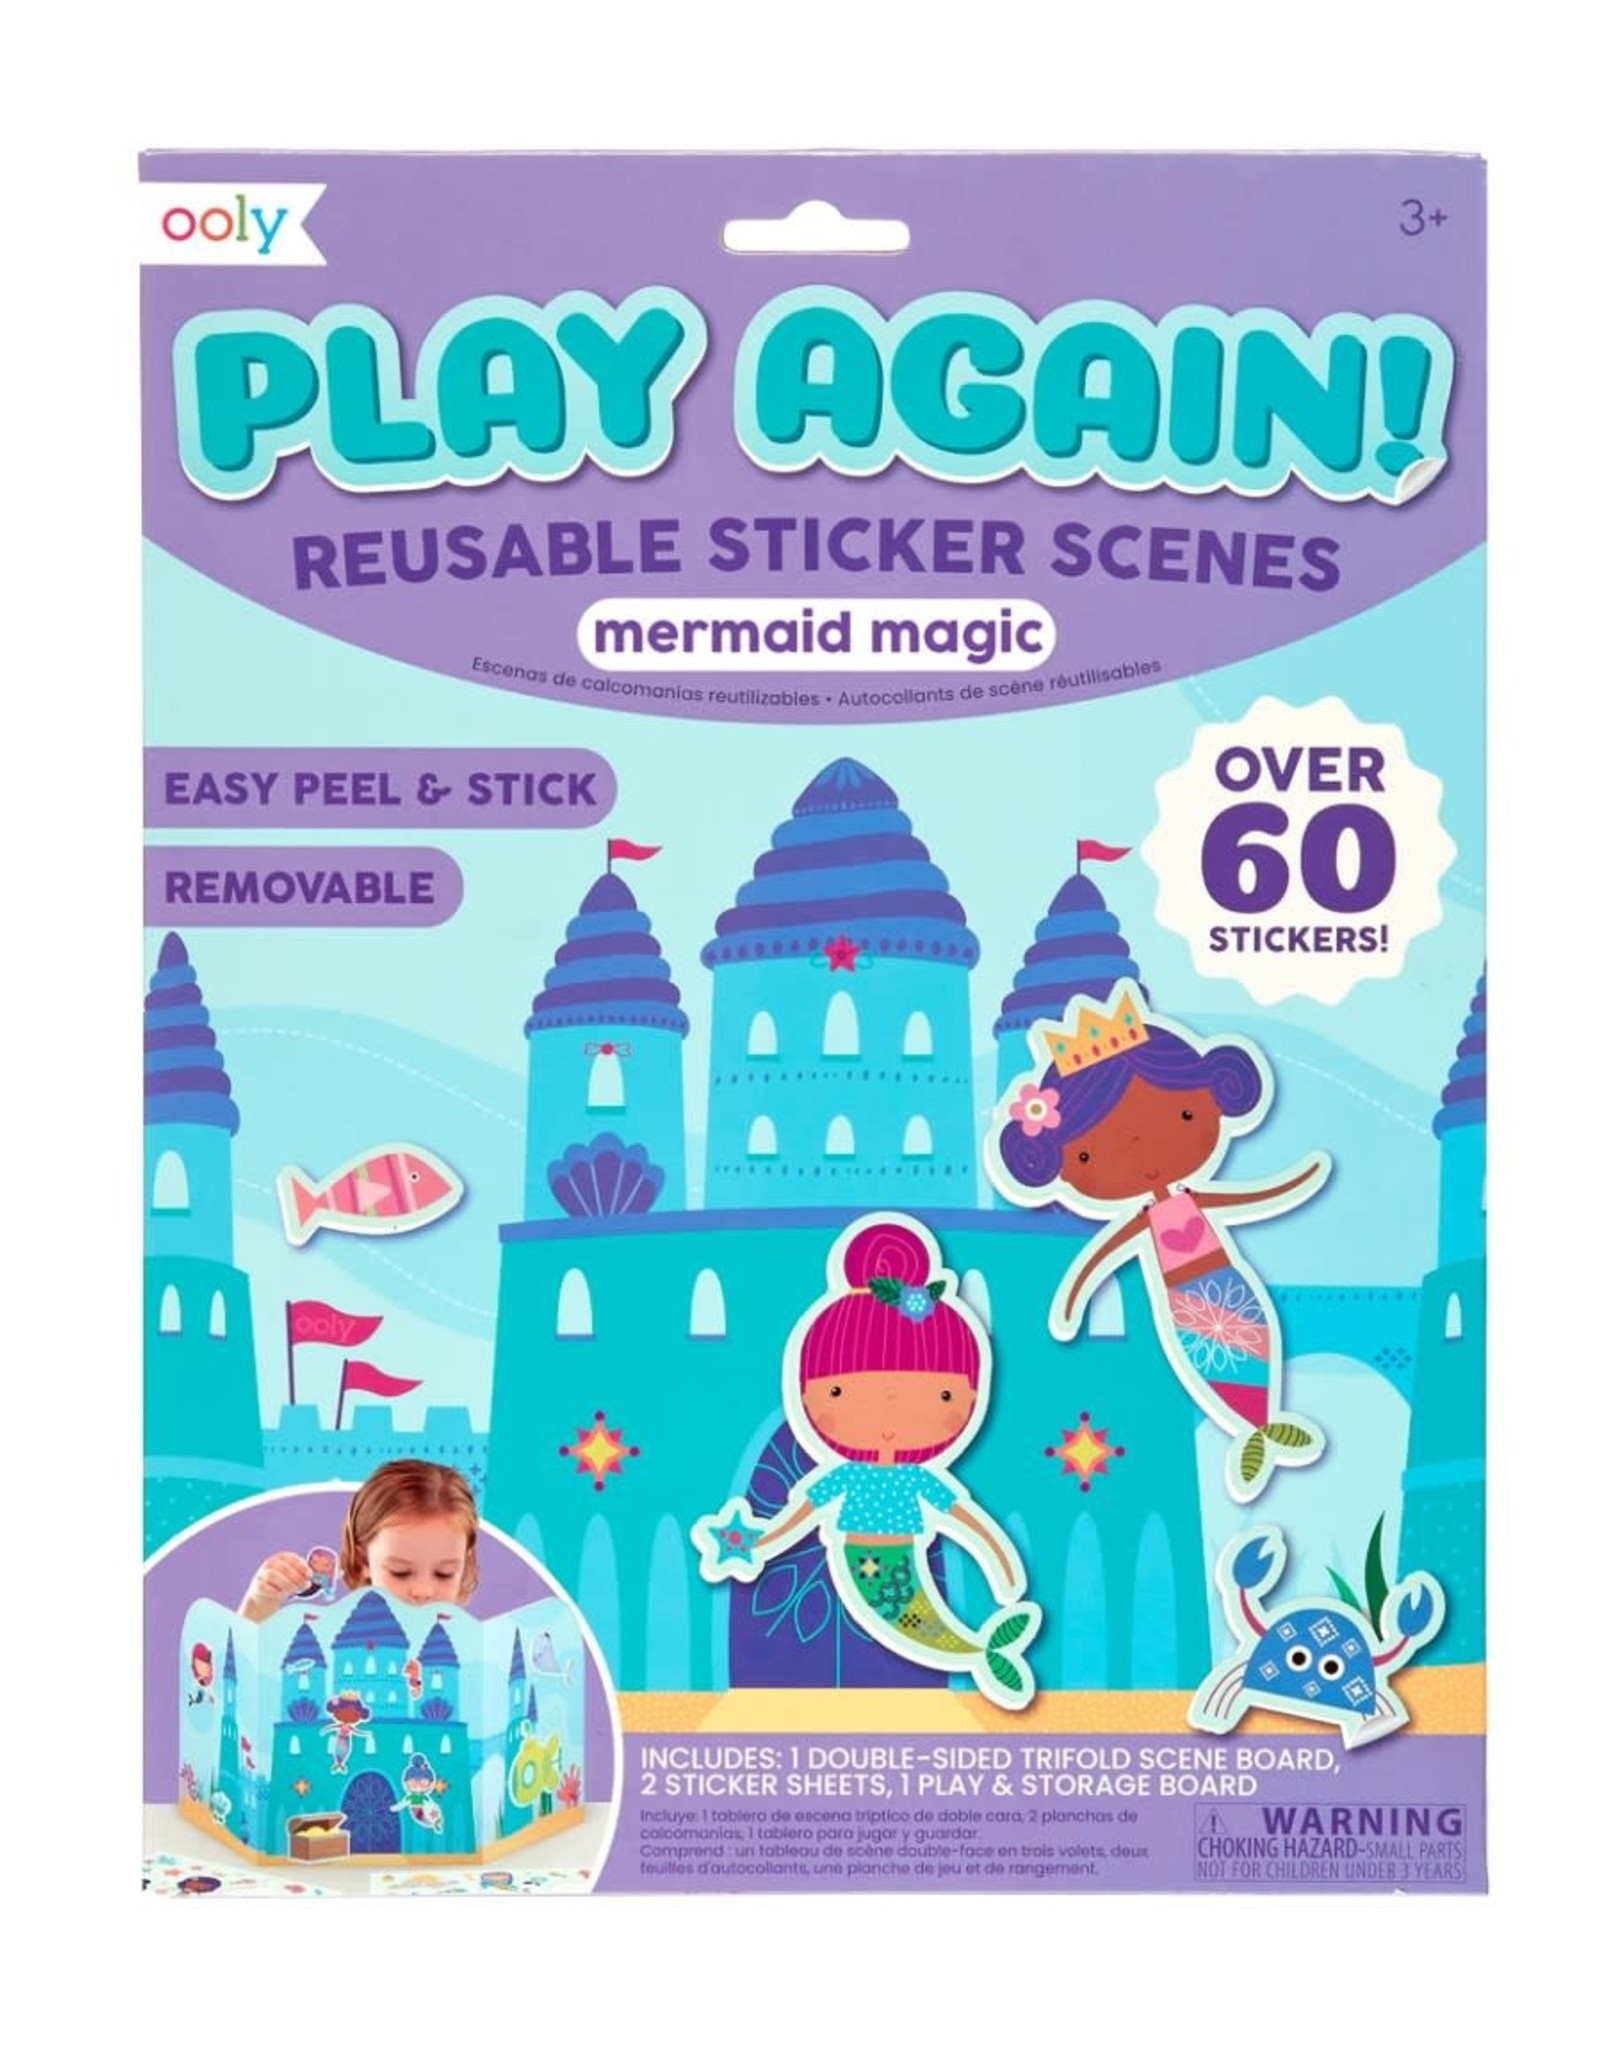 Ooly Play Again! Reusable Sticker Scenes: Mermaid Magic